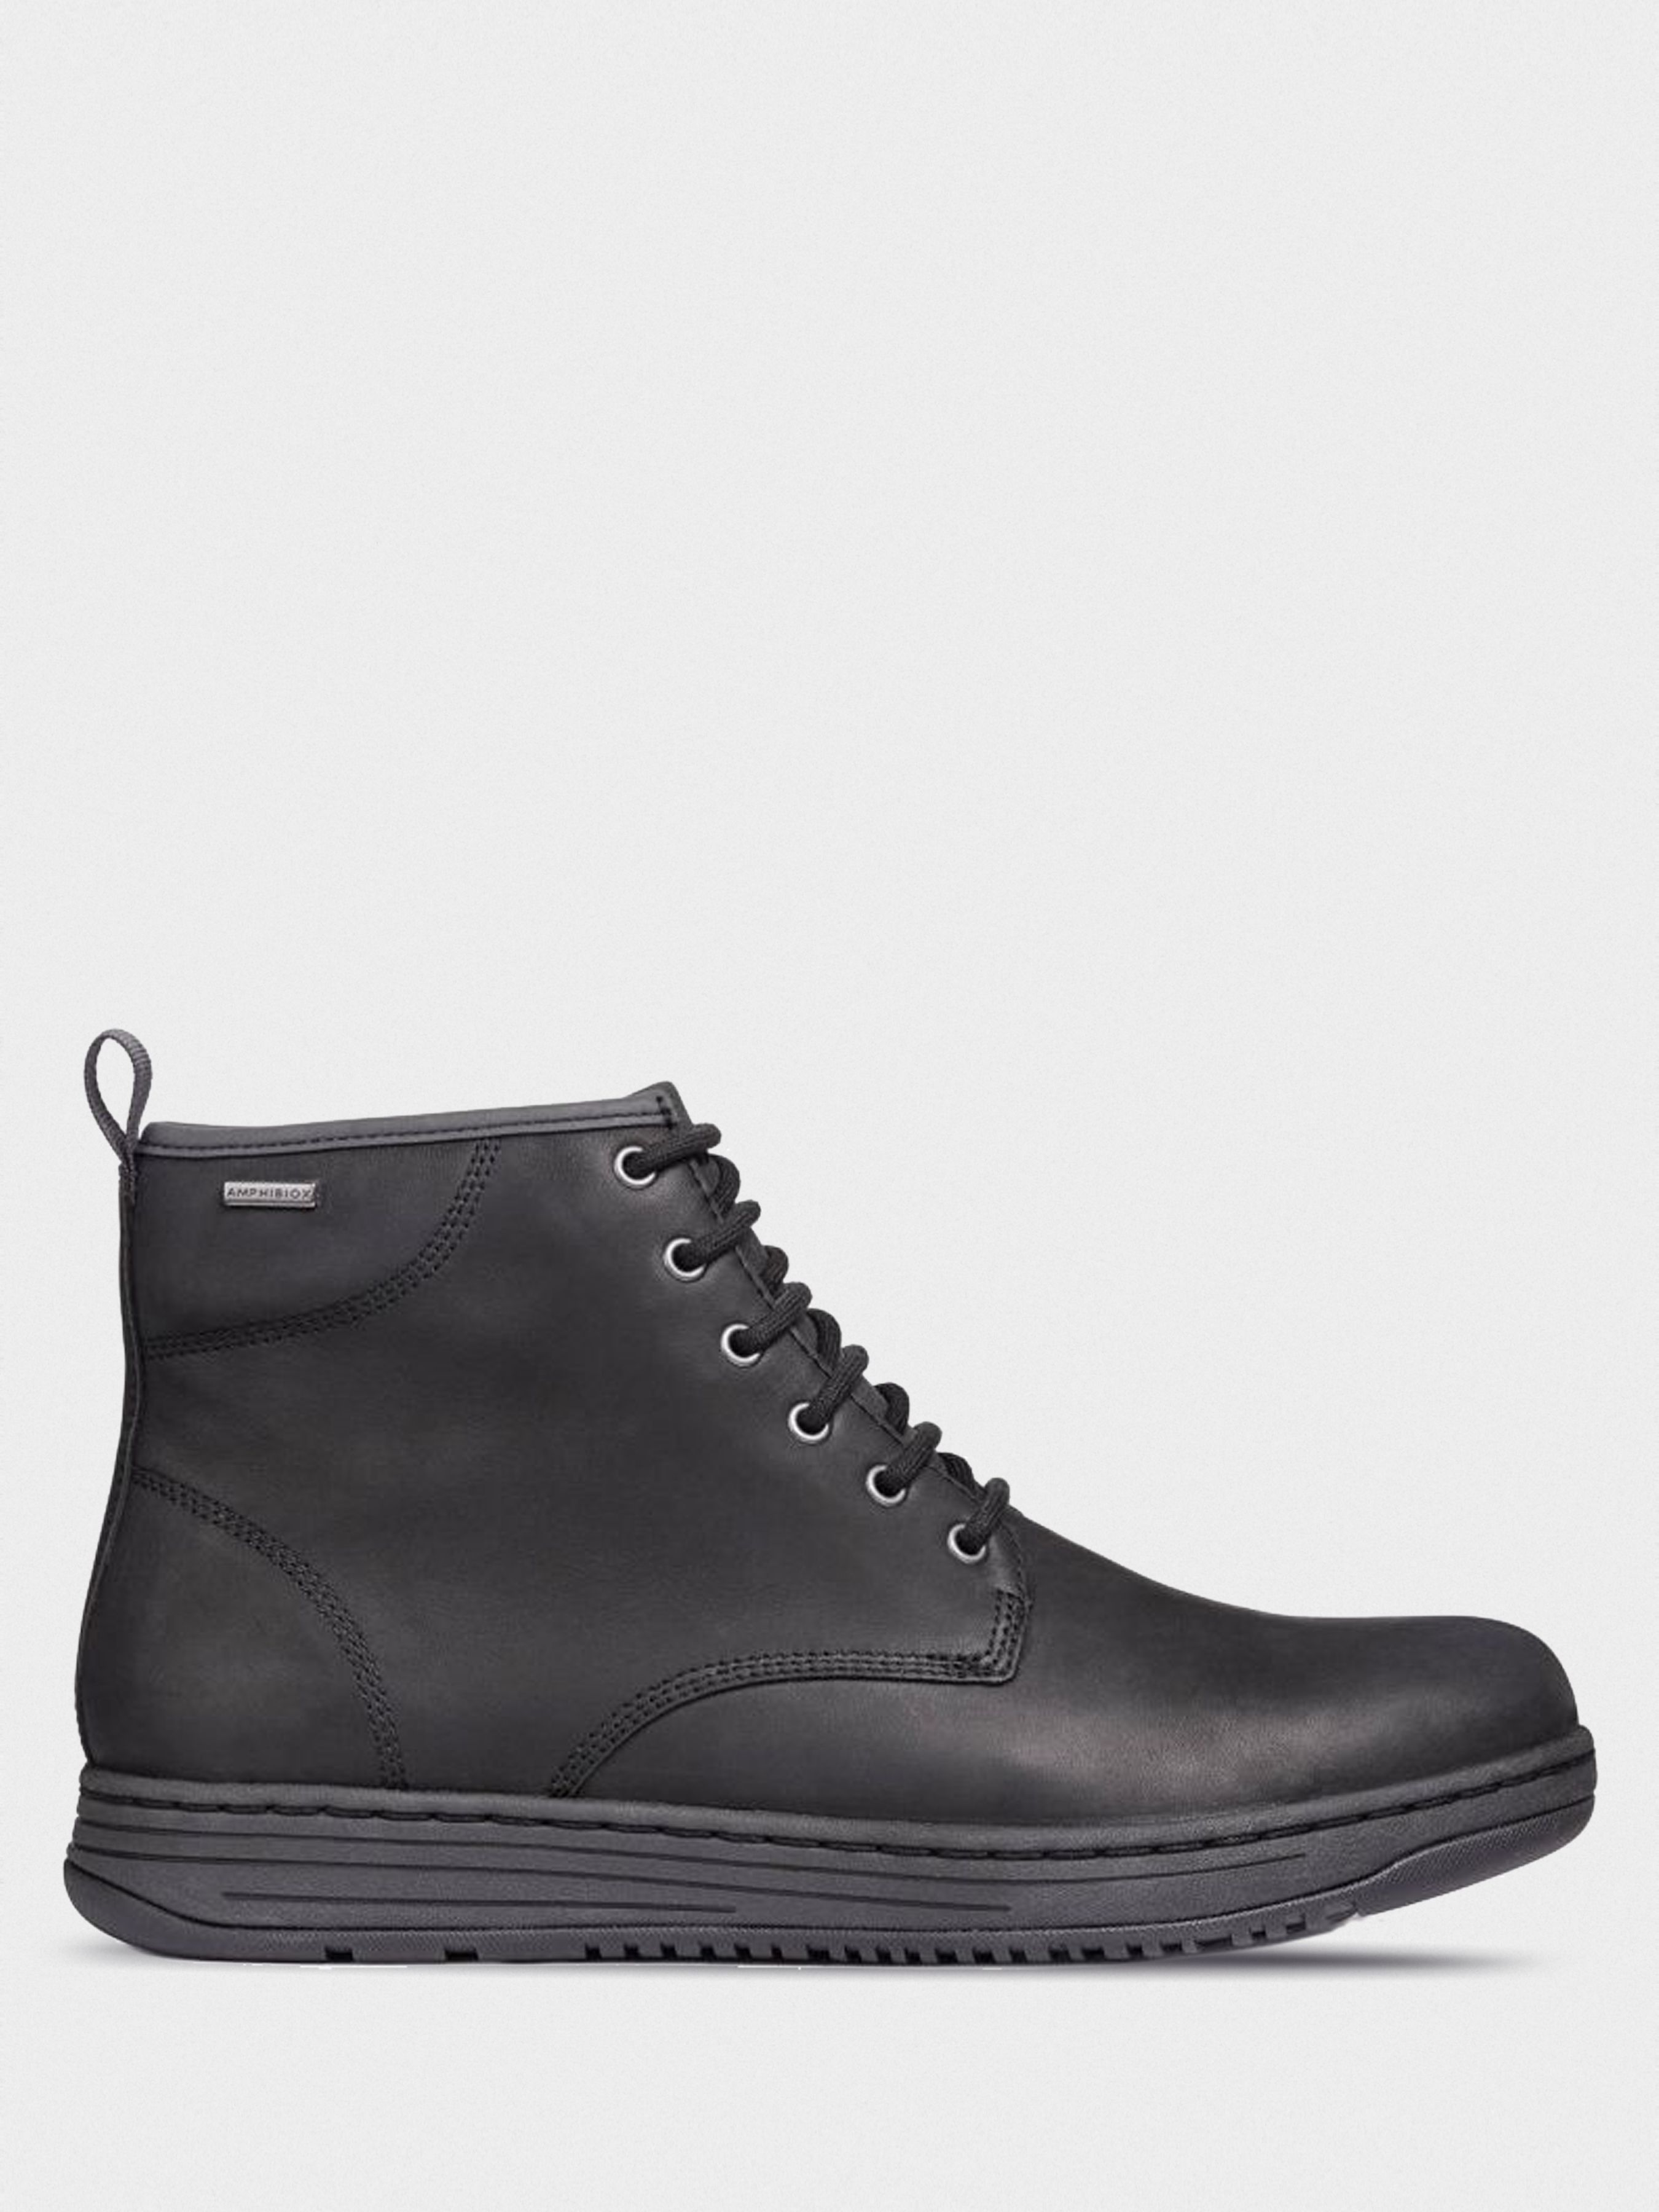 Ботинки мужские Geox ABROAB ABX XM1904 модная обувь, 2017